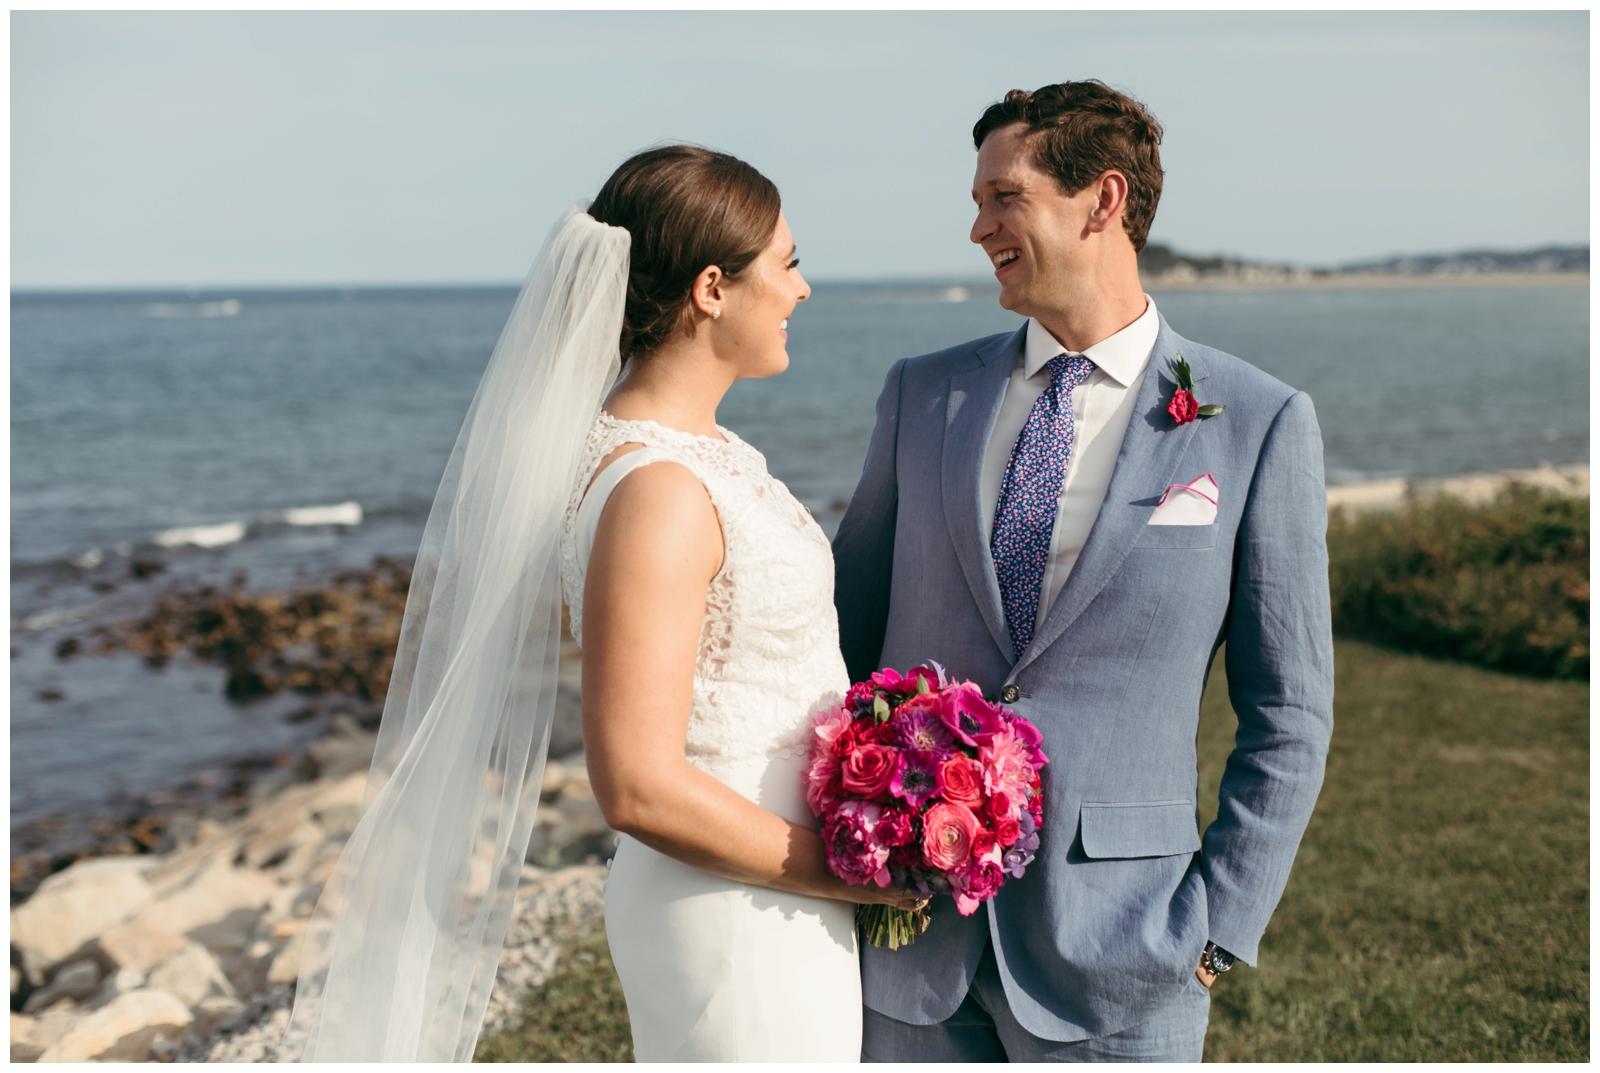 Bailey-Q-Photo-Backyard-Wedding-South-Shore-Boston-Wedding-Photographer-065.jpg